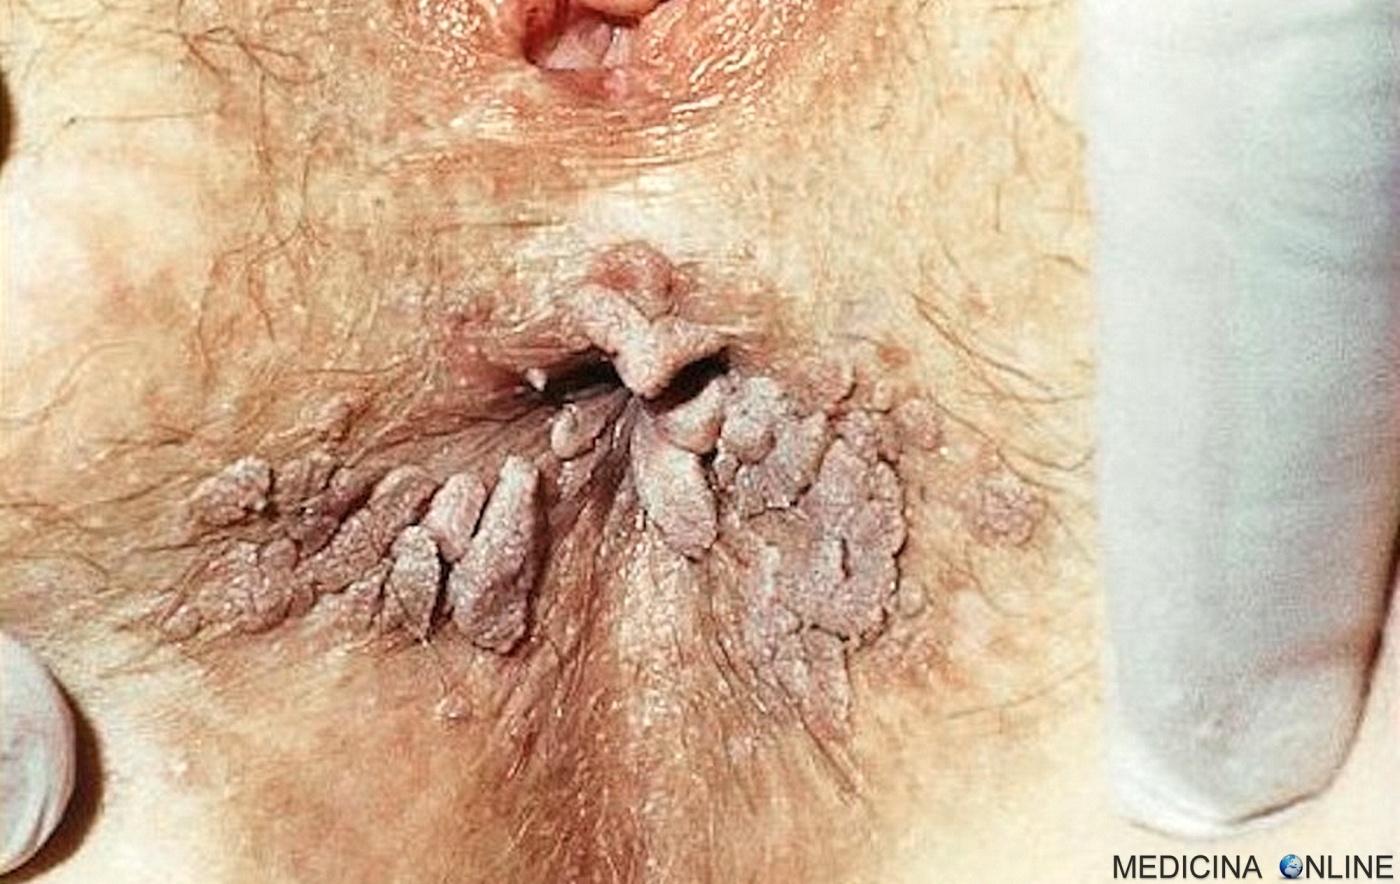 cancer colon sigmoide genital human papilloma virus